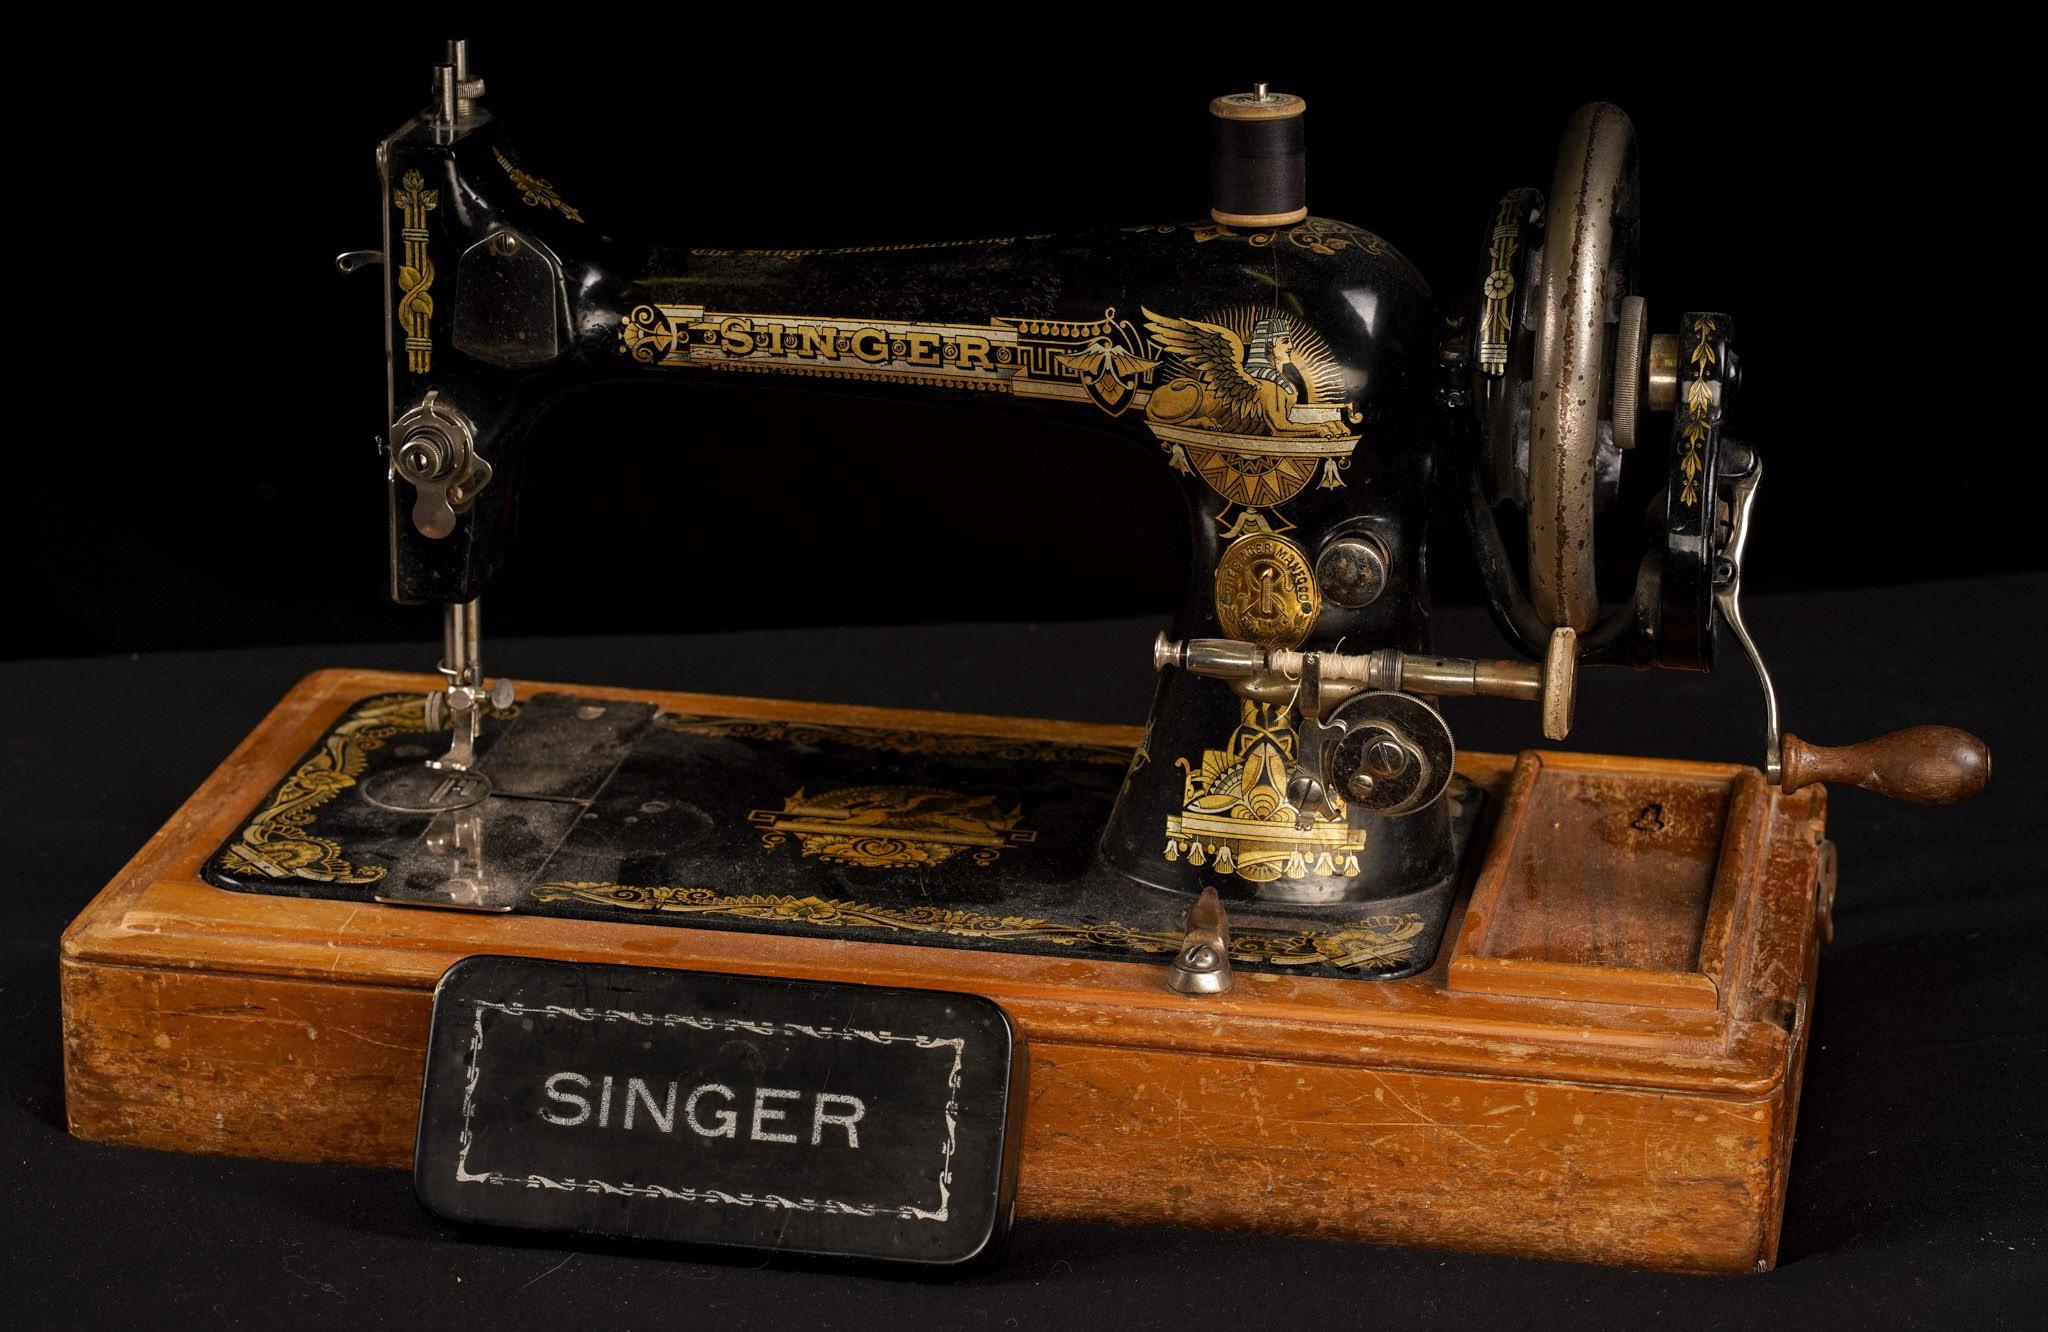 Singer Sewing Machine - Derek Chambers